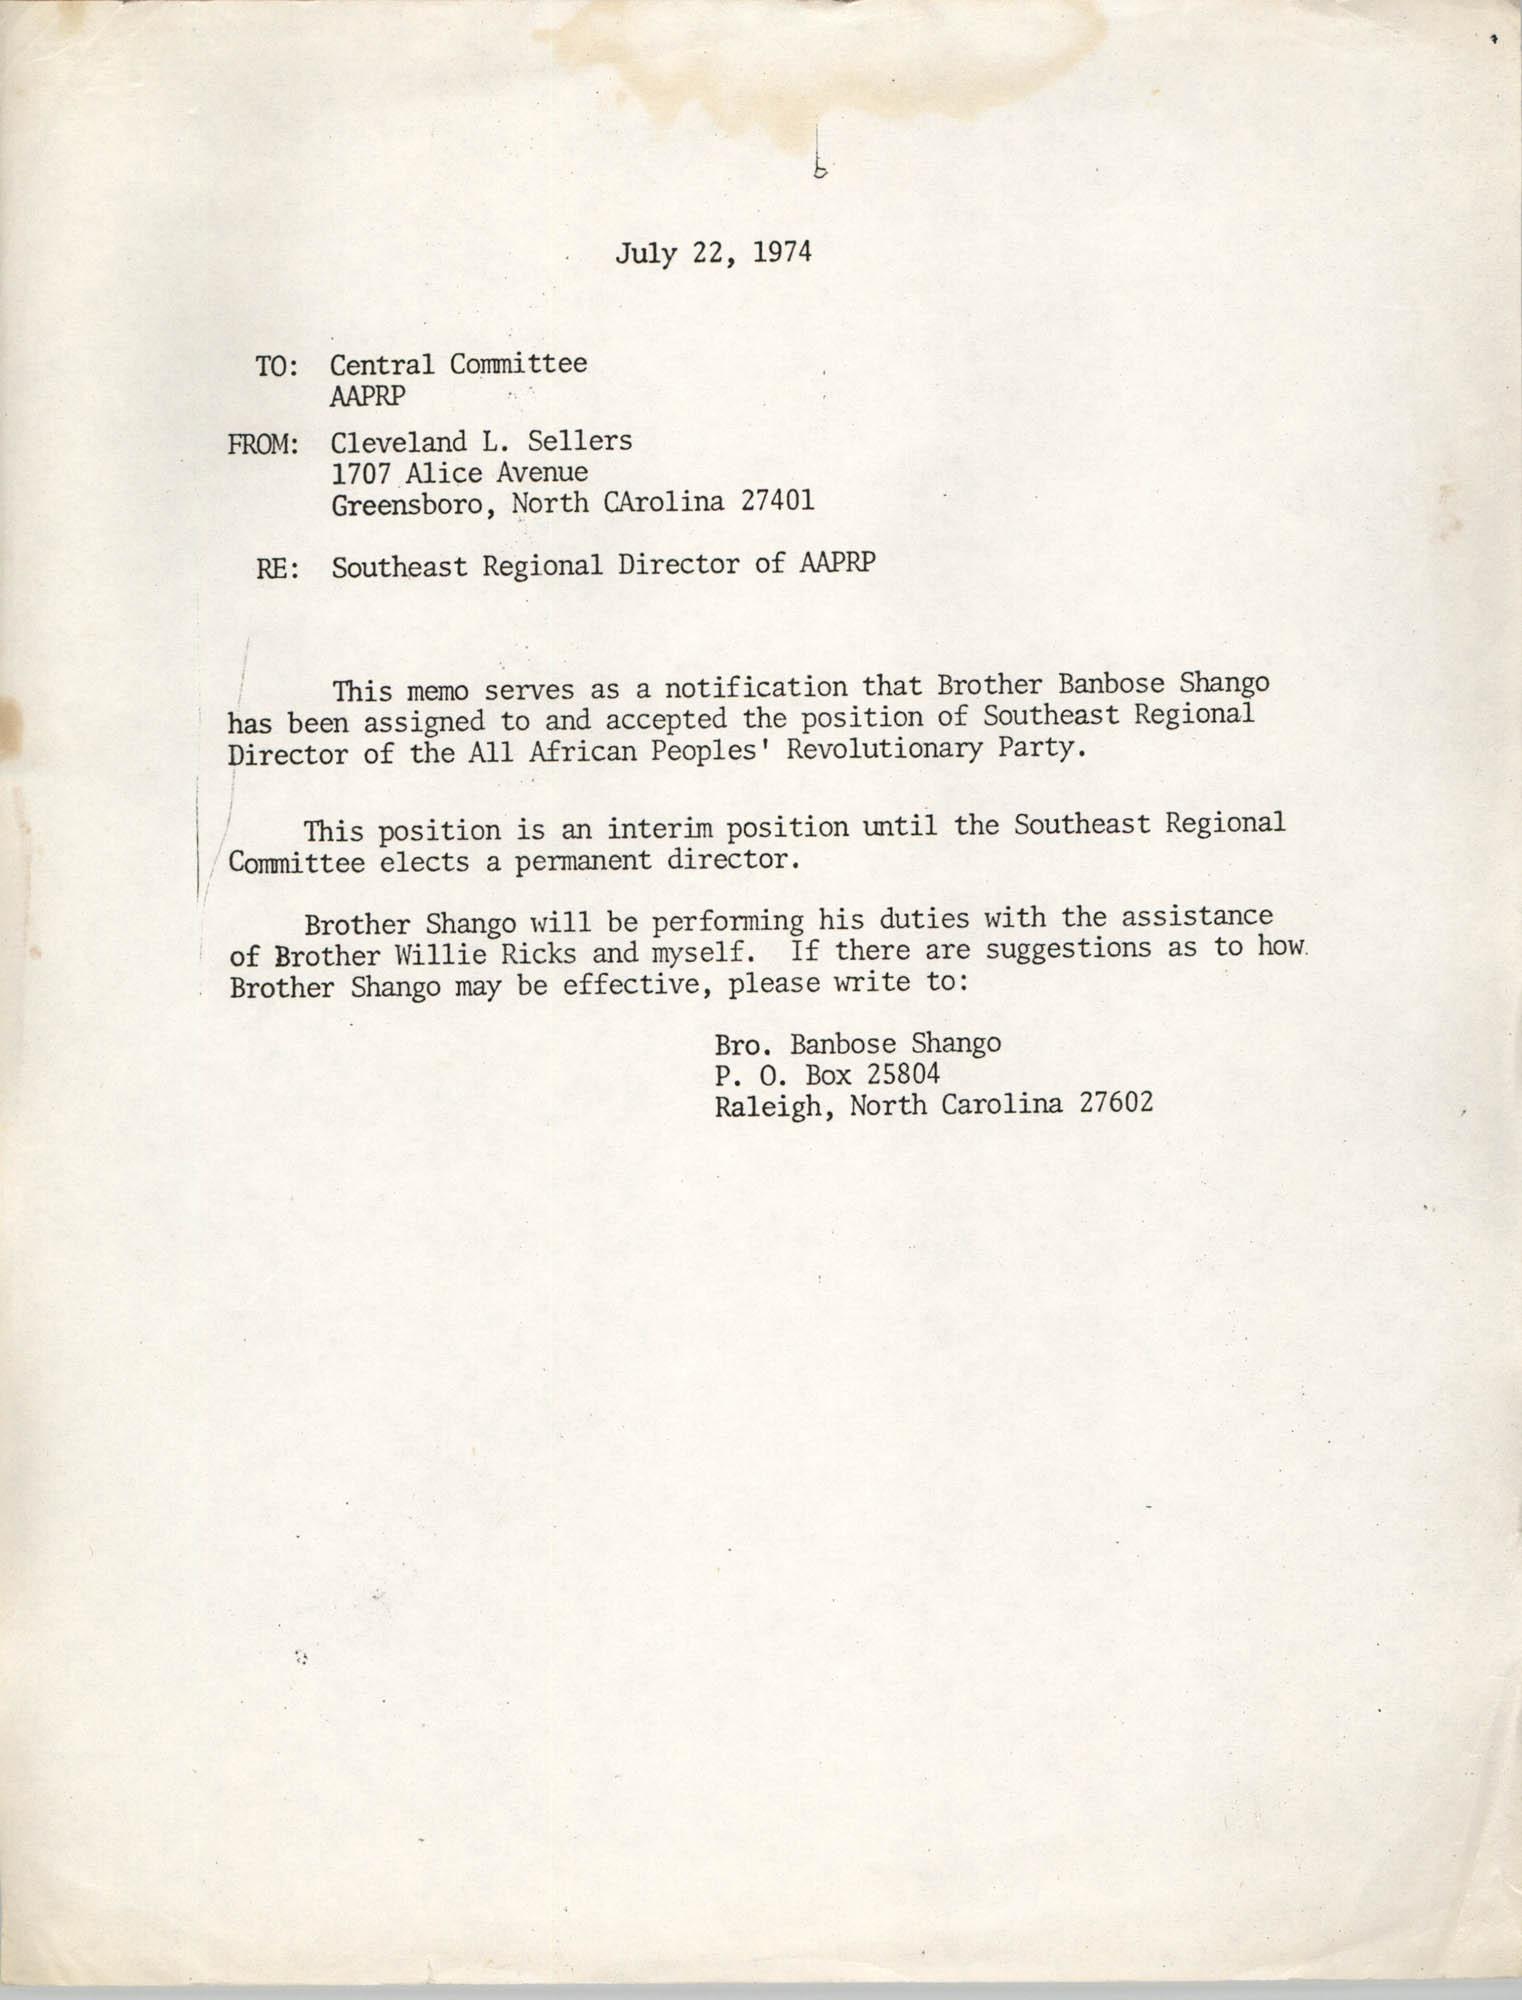 Memorandum from Jan Bailey, August 16, 1974